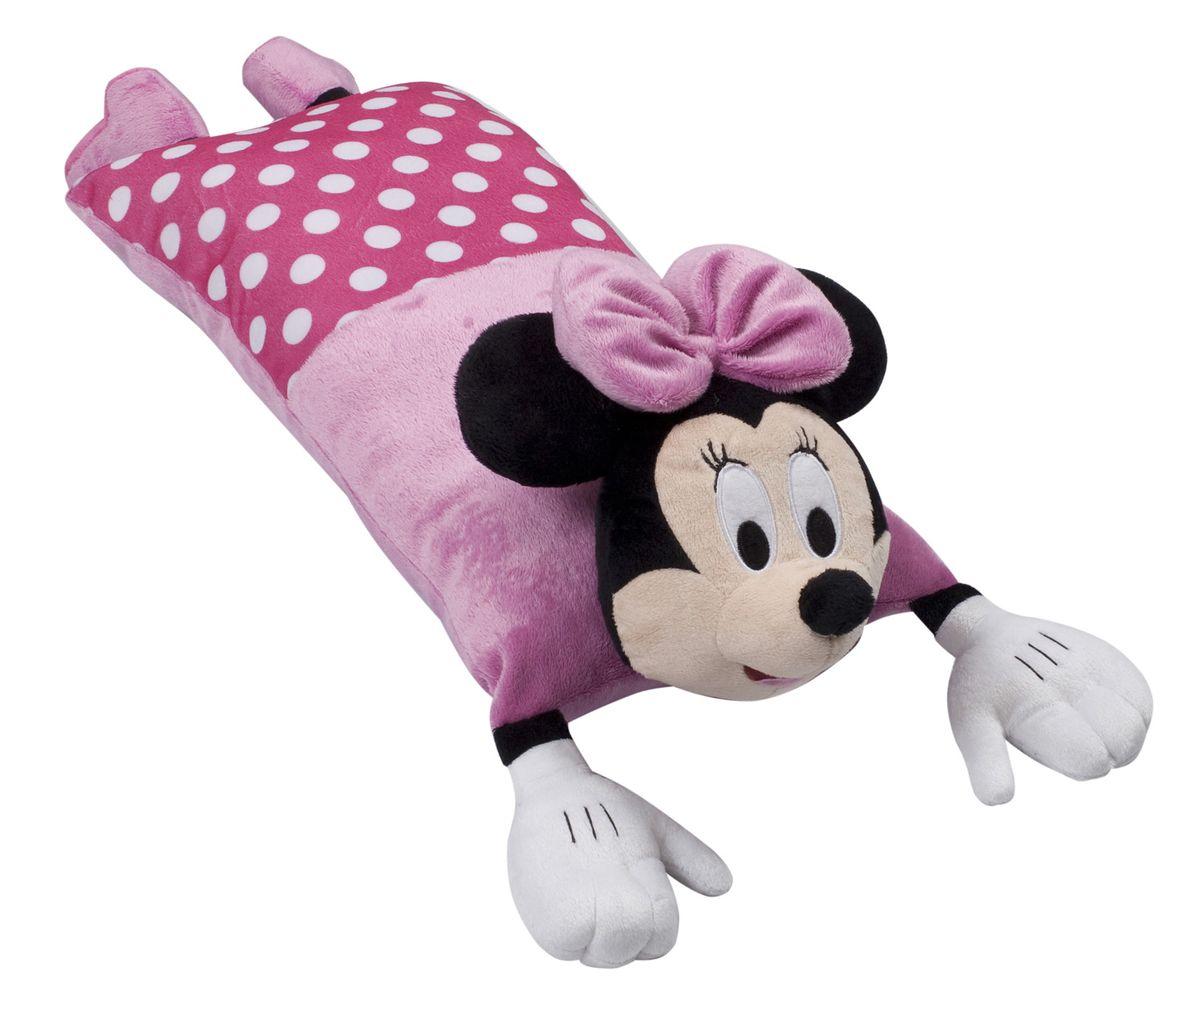 15546 Подушка Minnie Mouse (Минни Маус), размер 50х25 см